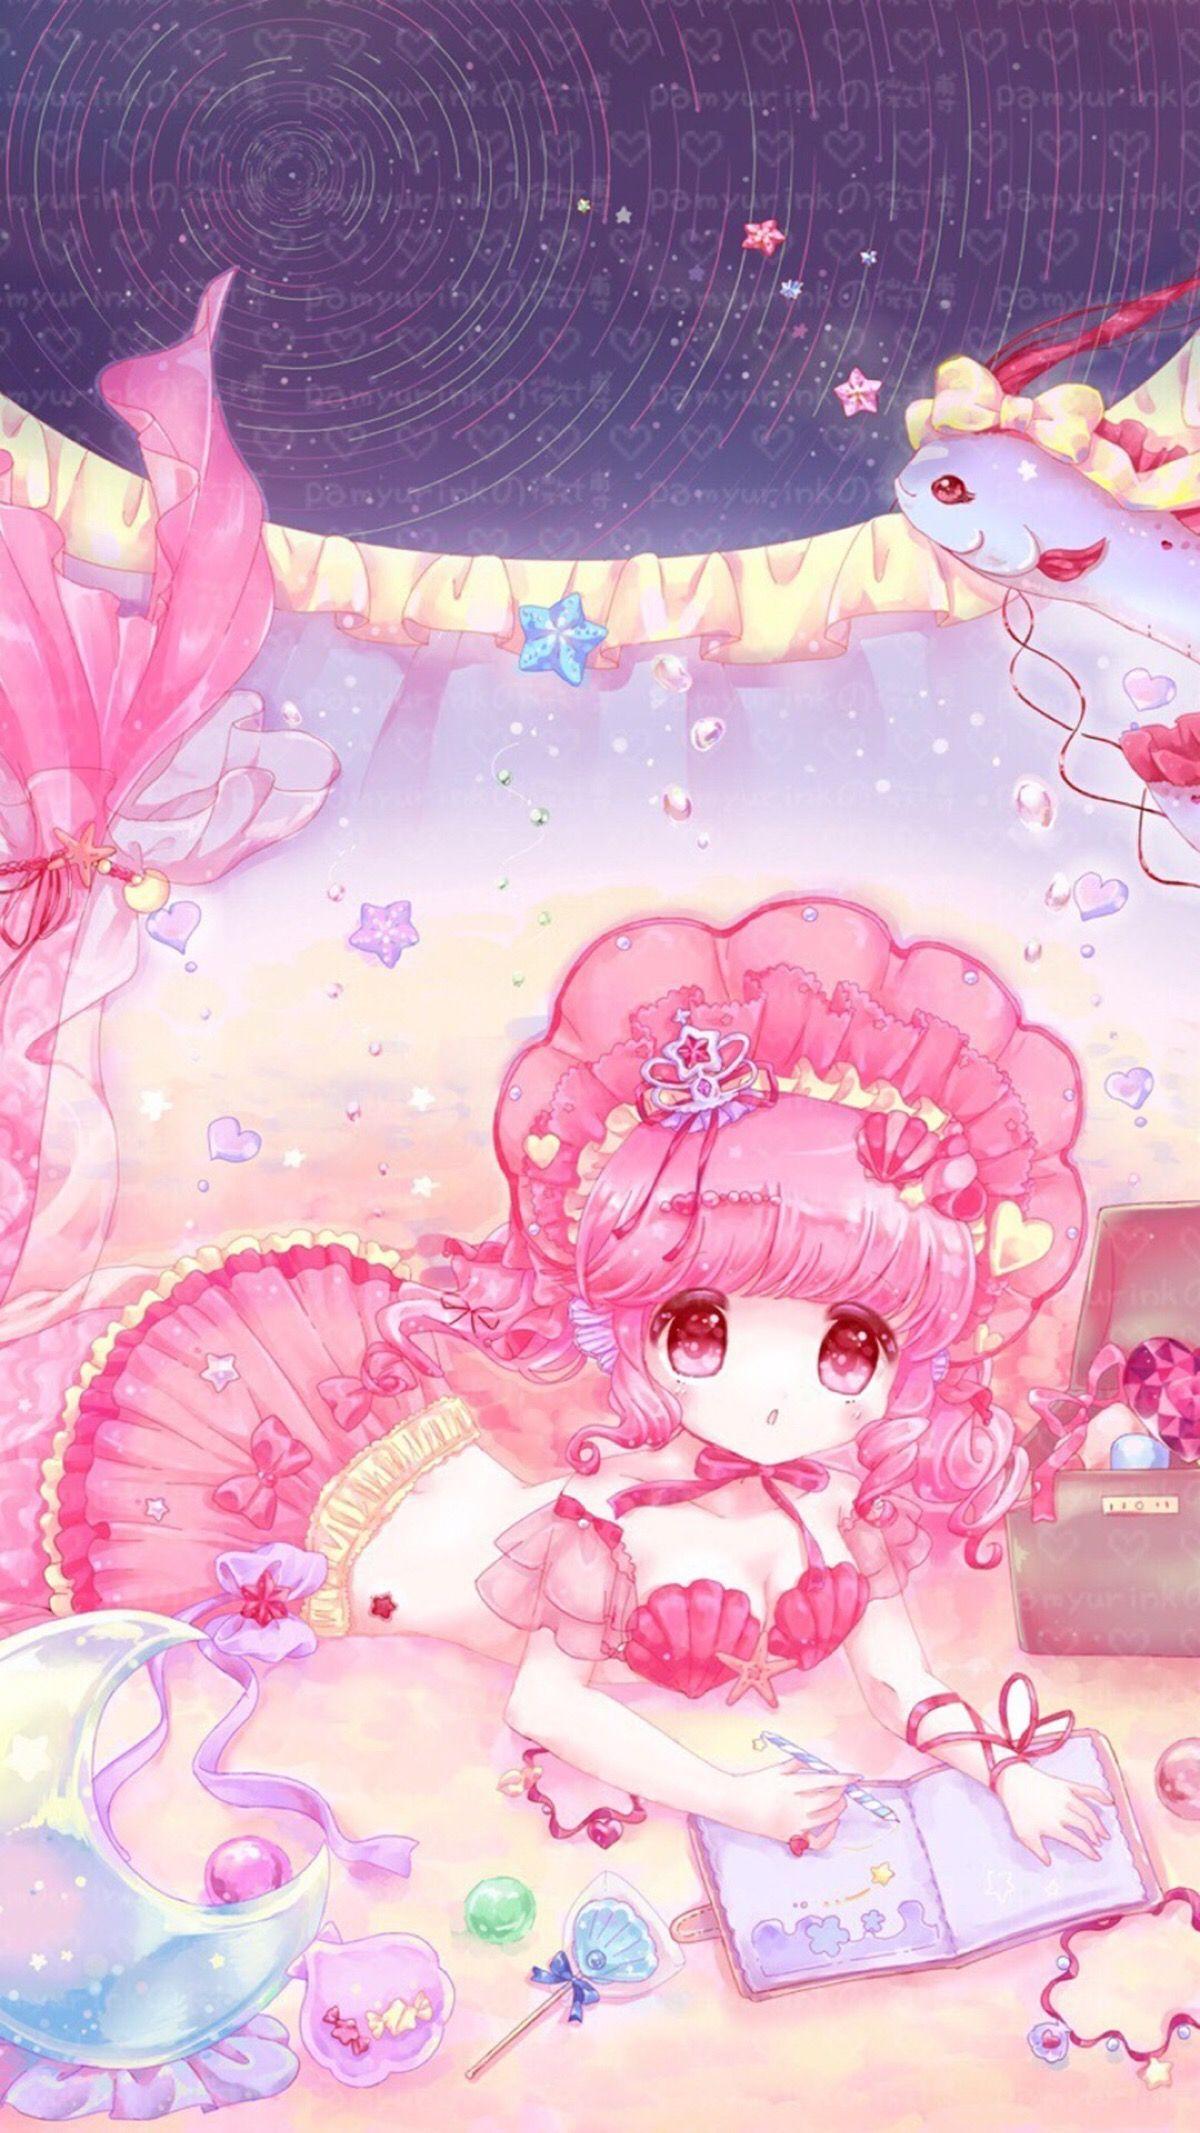 Find This Pin And More On Anime Manga Kawaii Wallpapers By Dasha